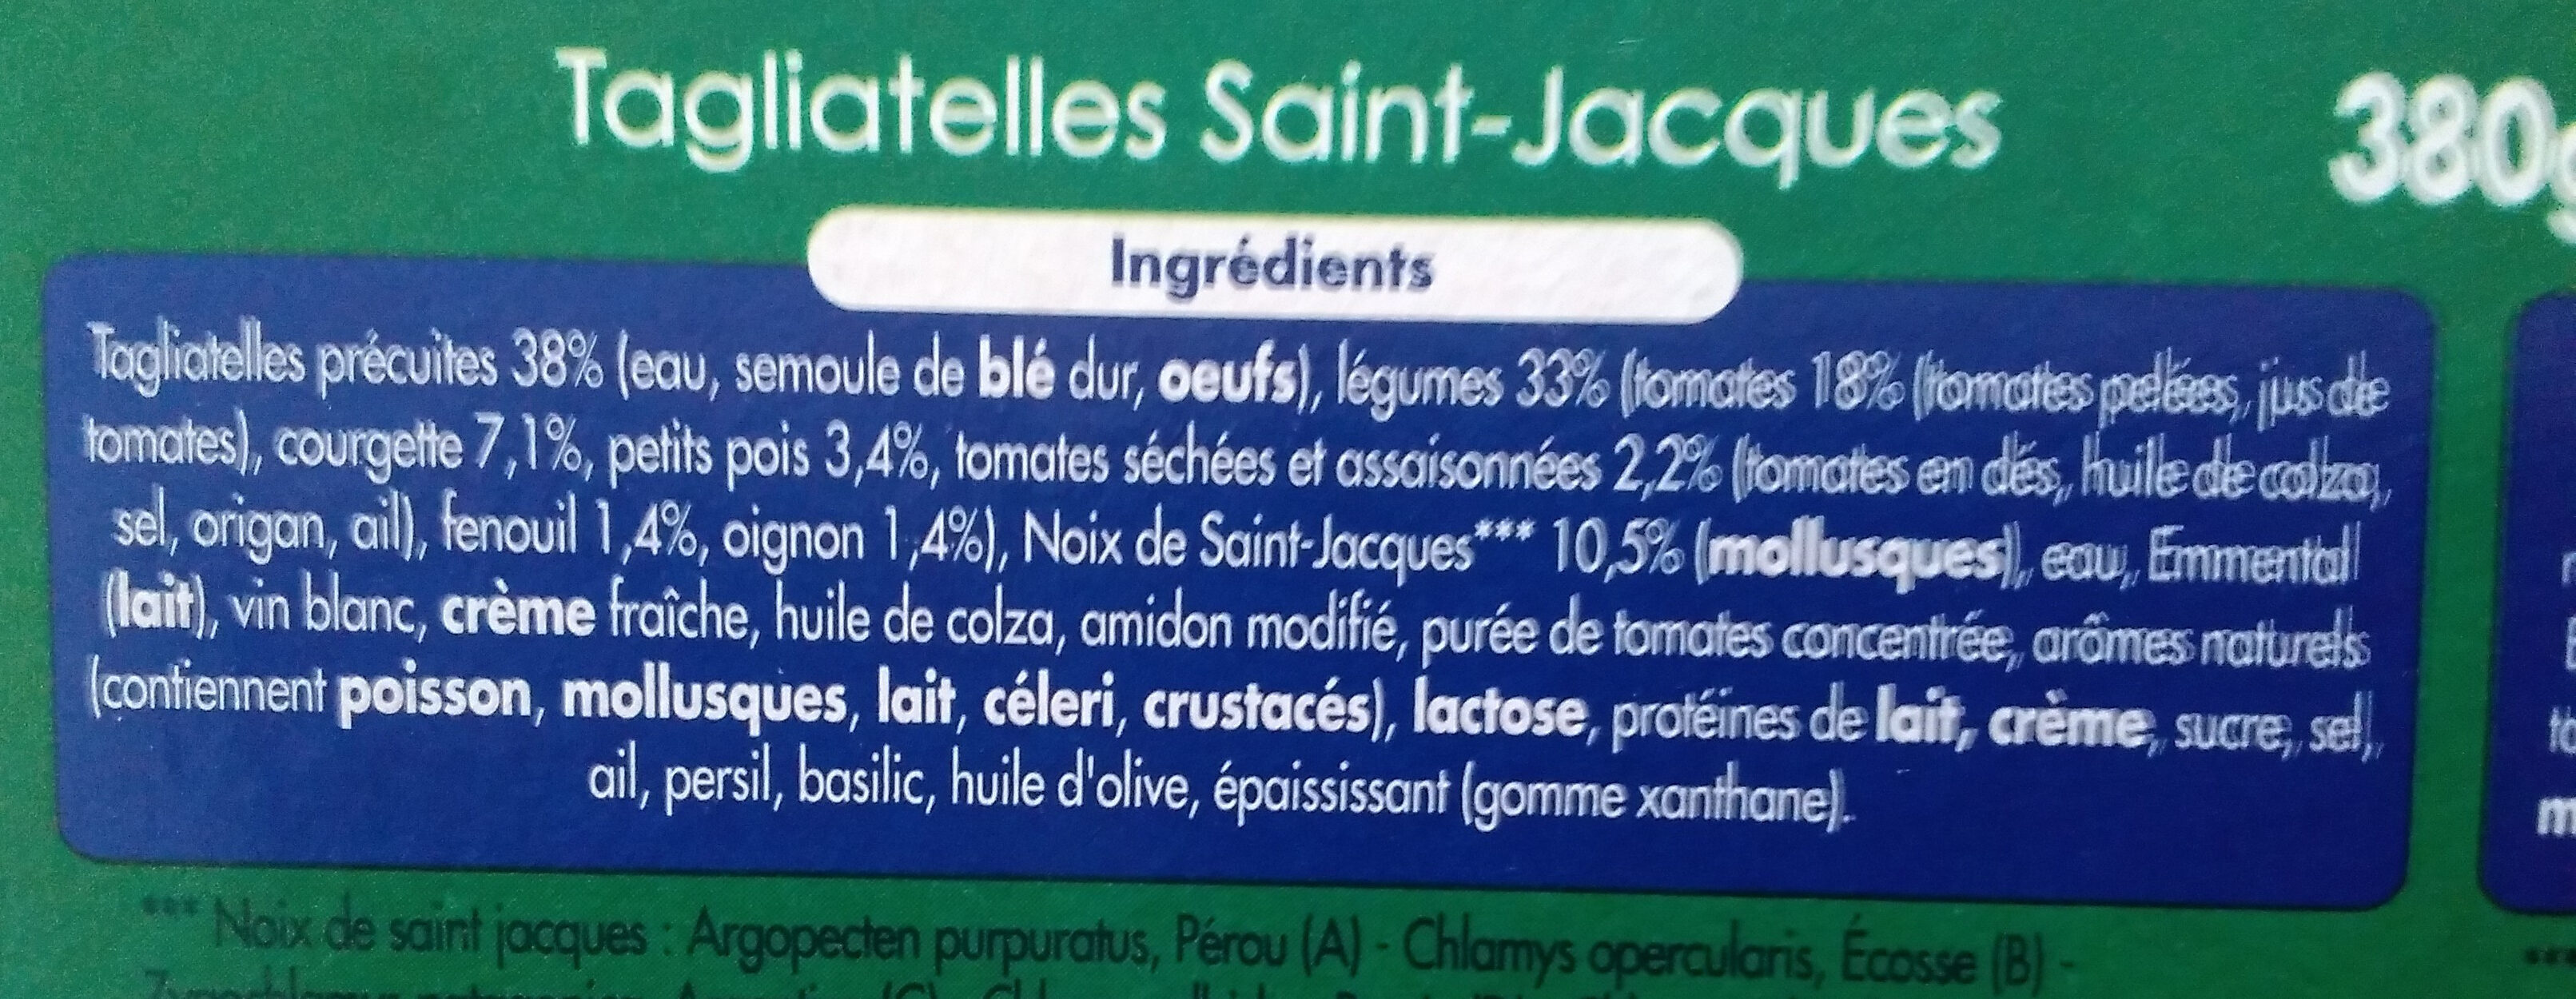 Tagliatelles saint jacques - Ingrediënten - fr